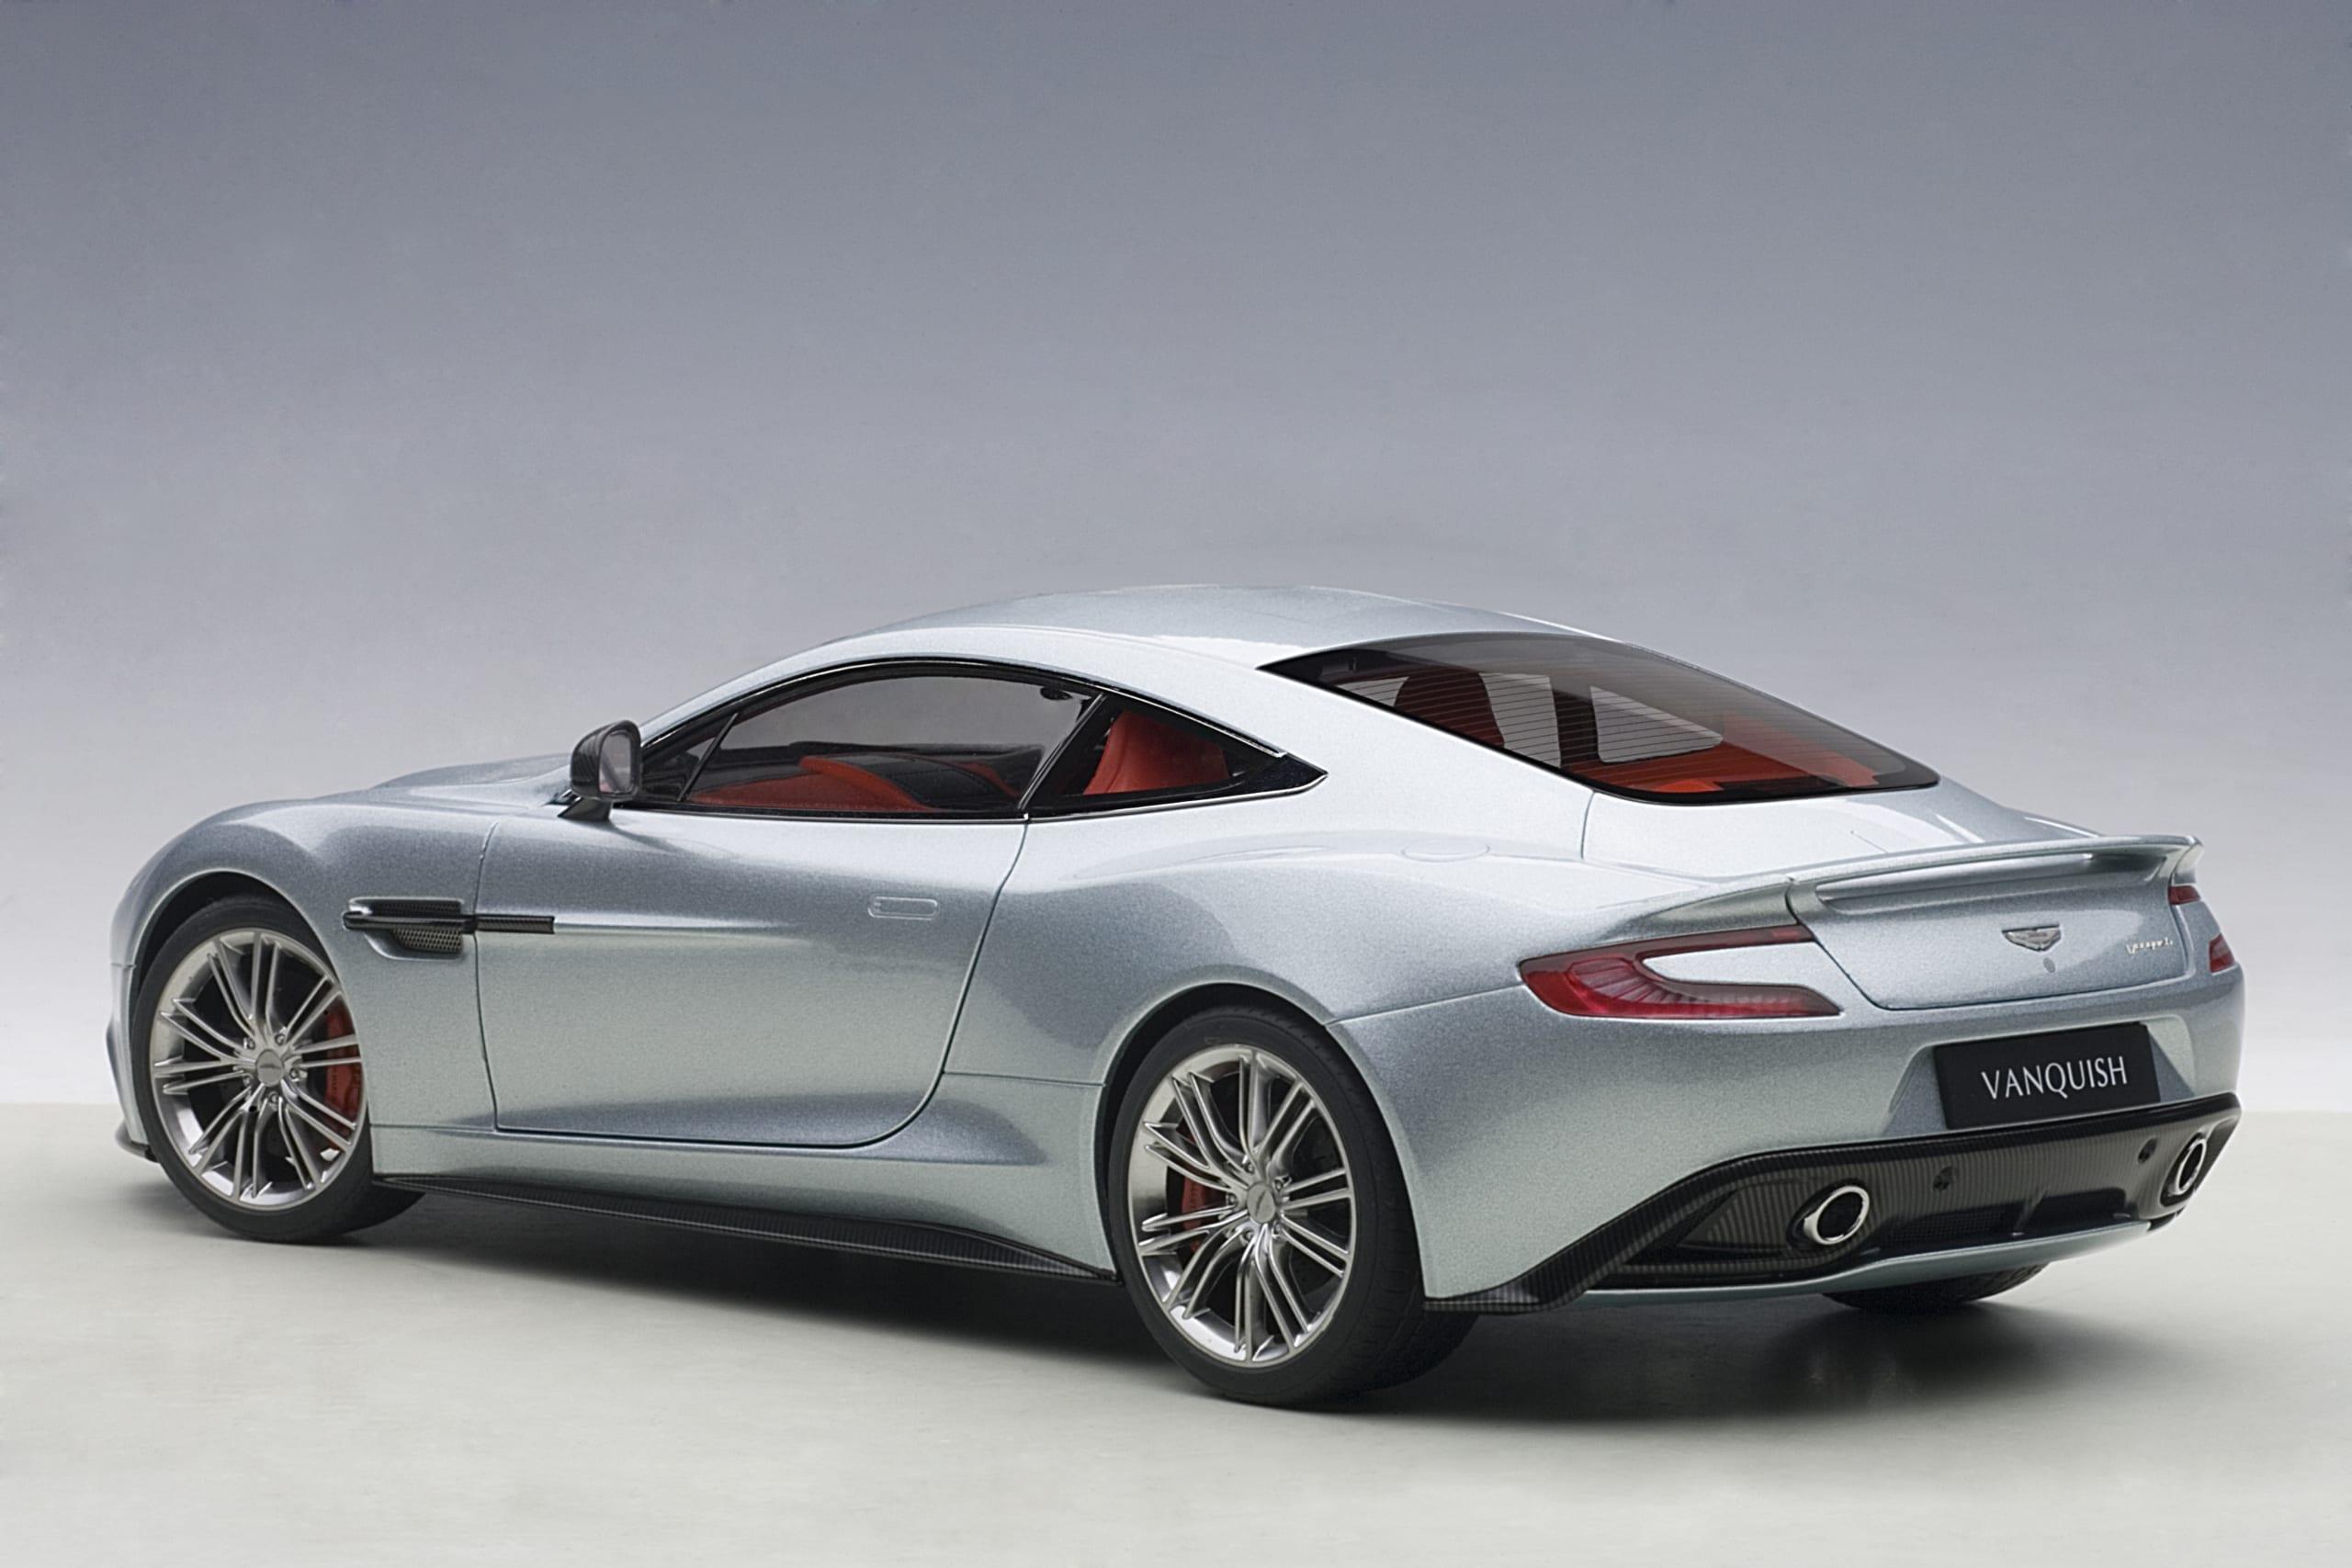 Aston Martin Vanquish 2015 Skyfall Silver Autoart